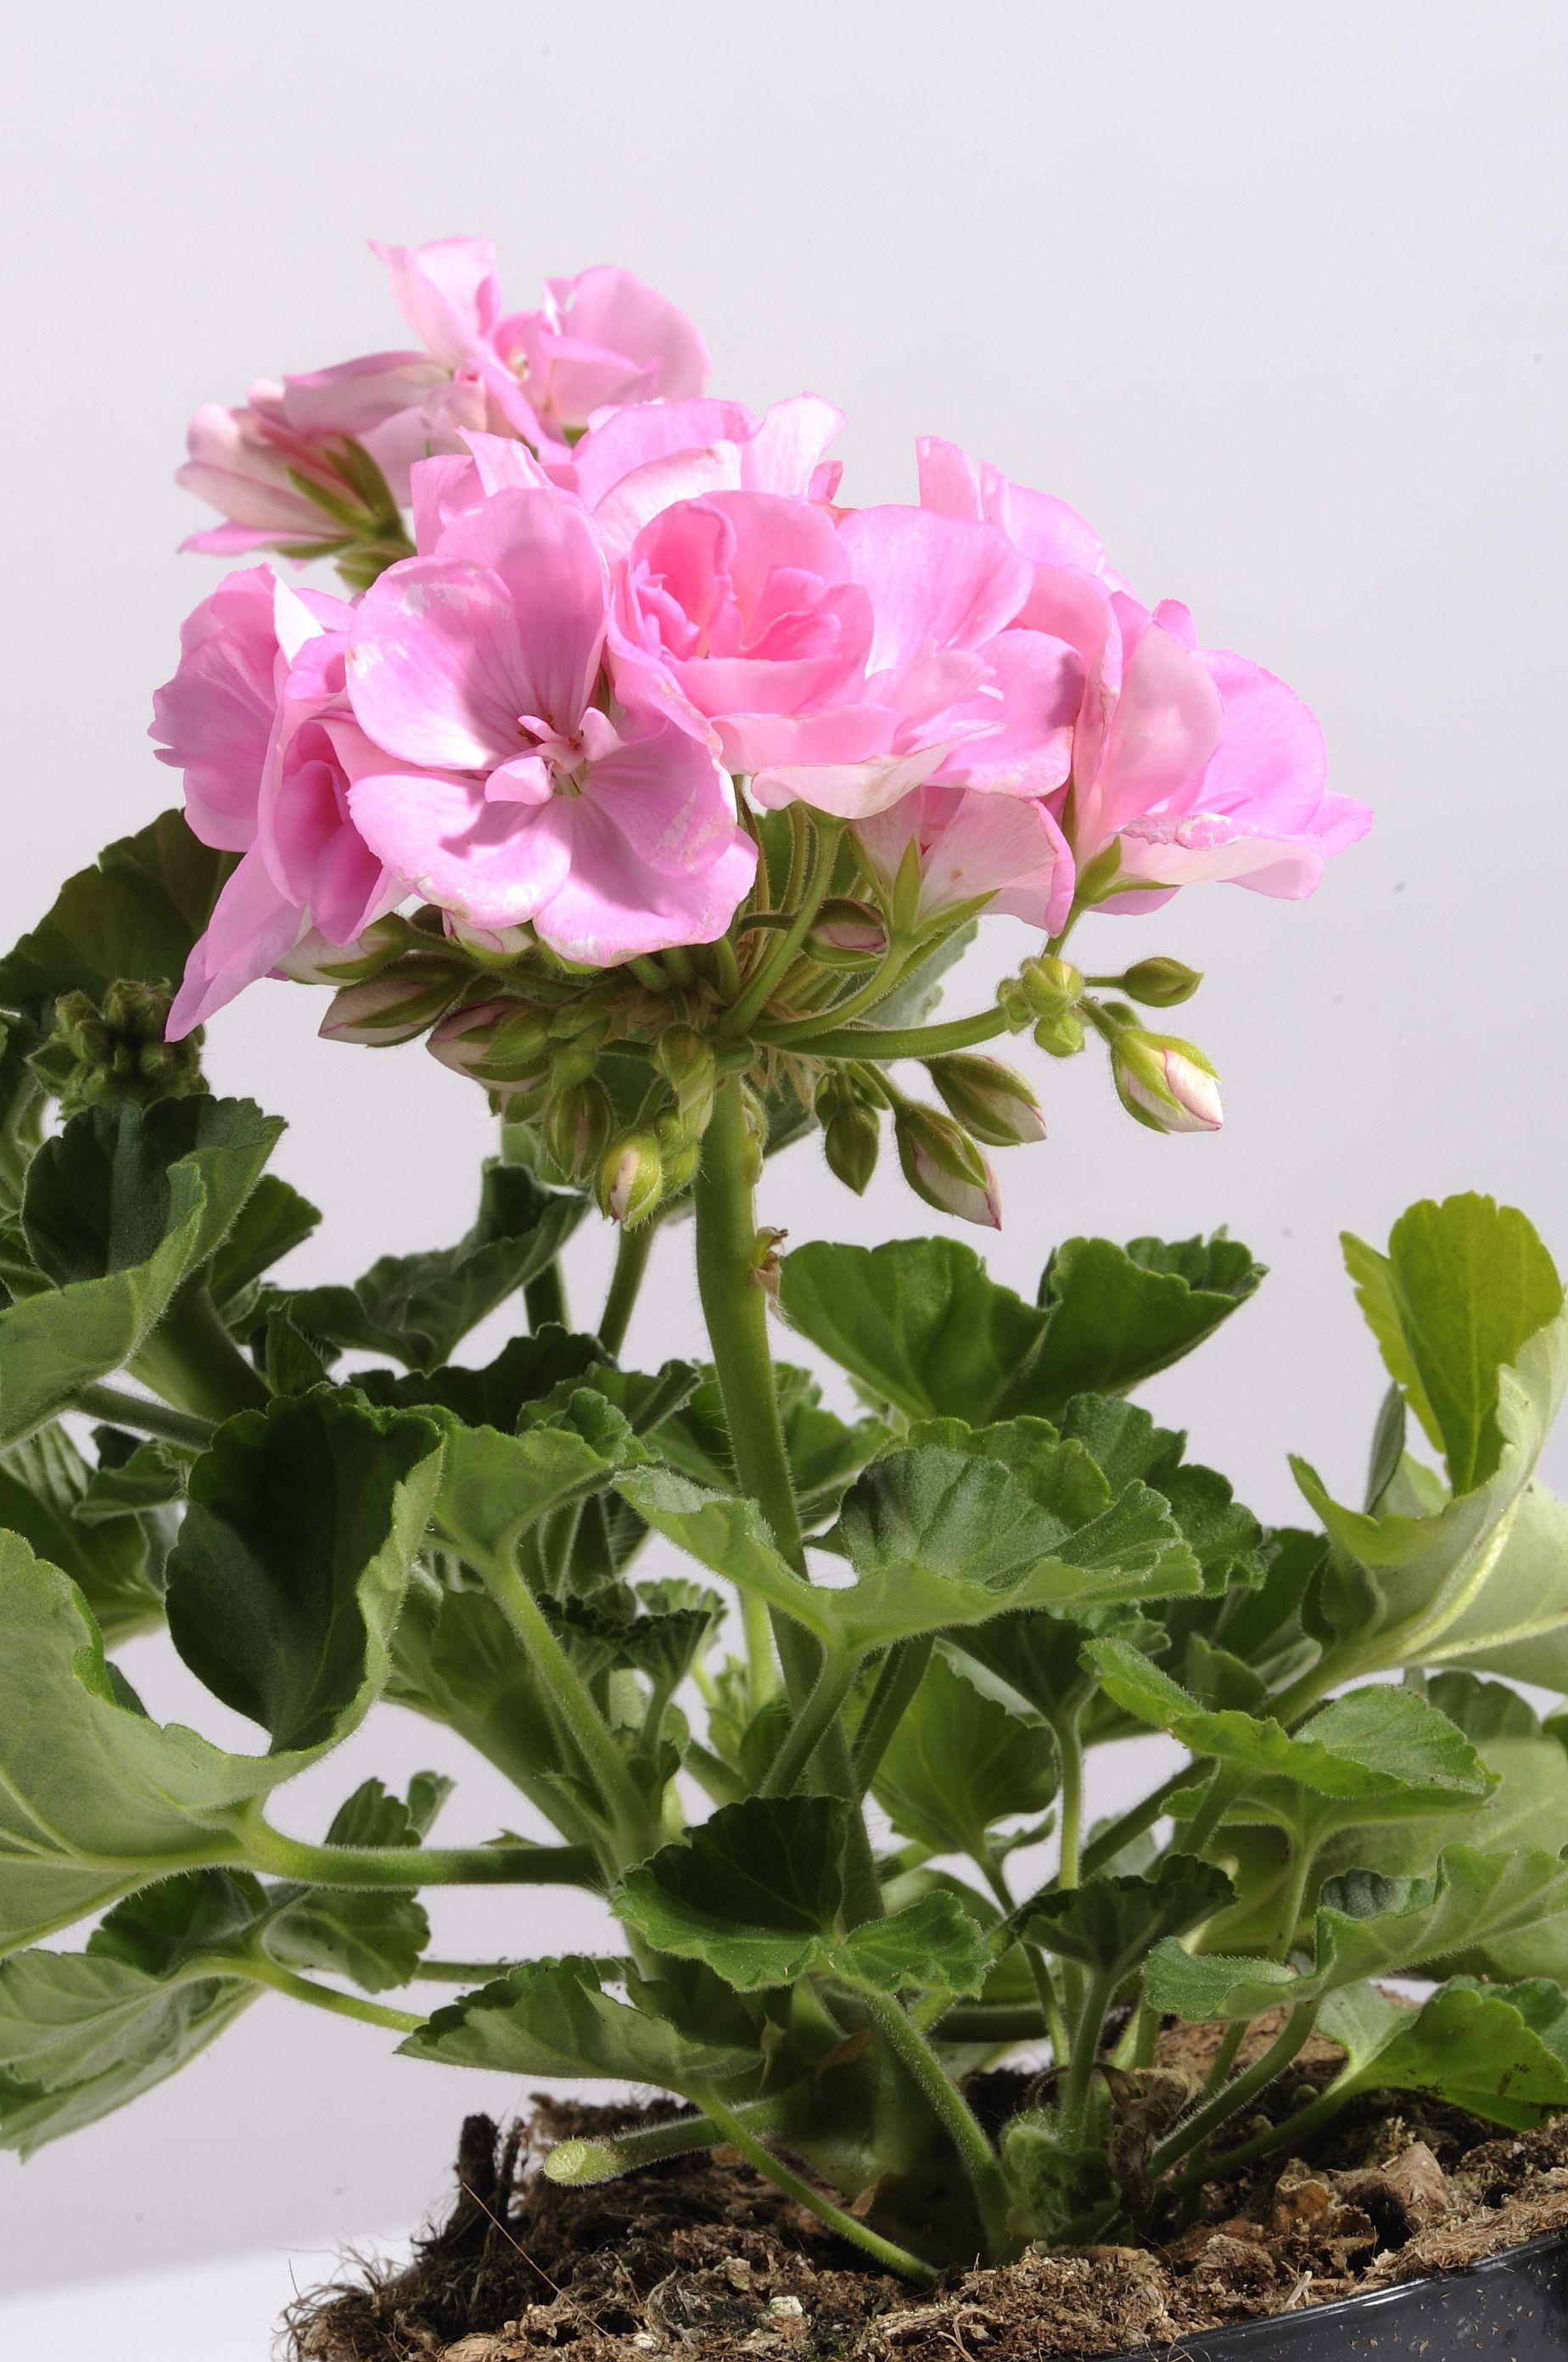 Geranio Zonale Geranium Pink Flower Flowers Plant Per Scoprirne